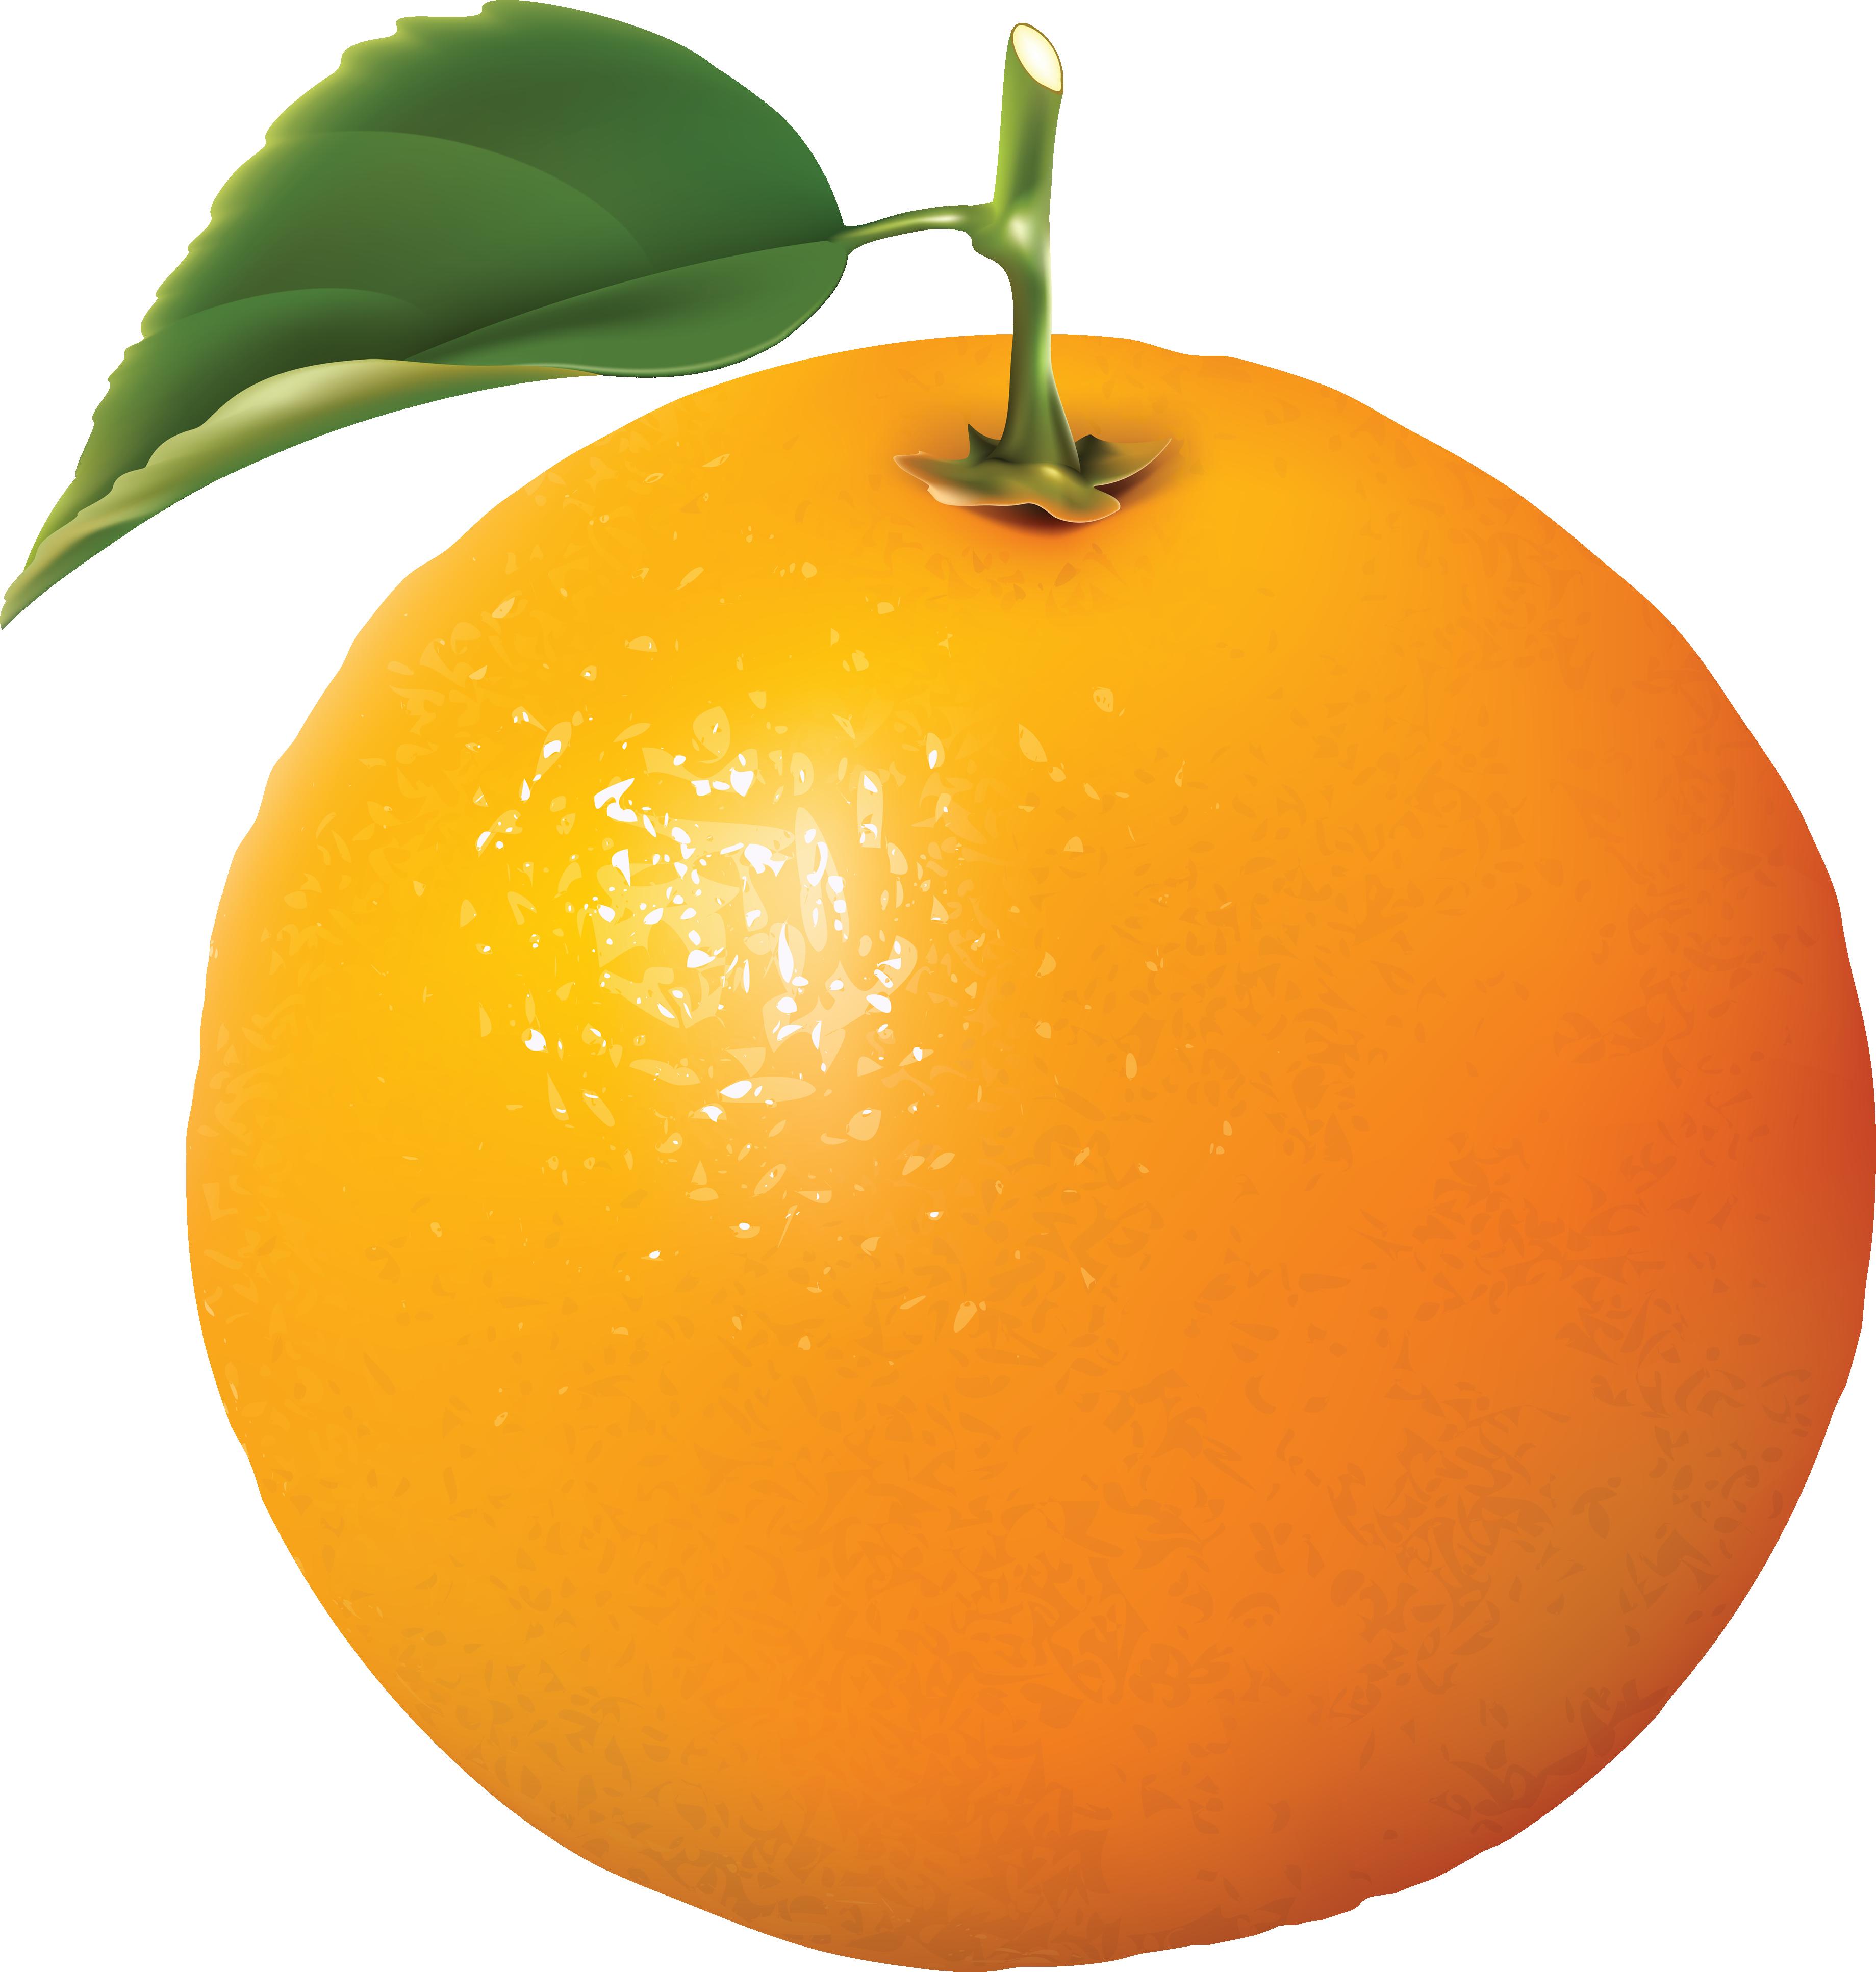 Orange Oranges Orange Fruits Drawing Oranges